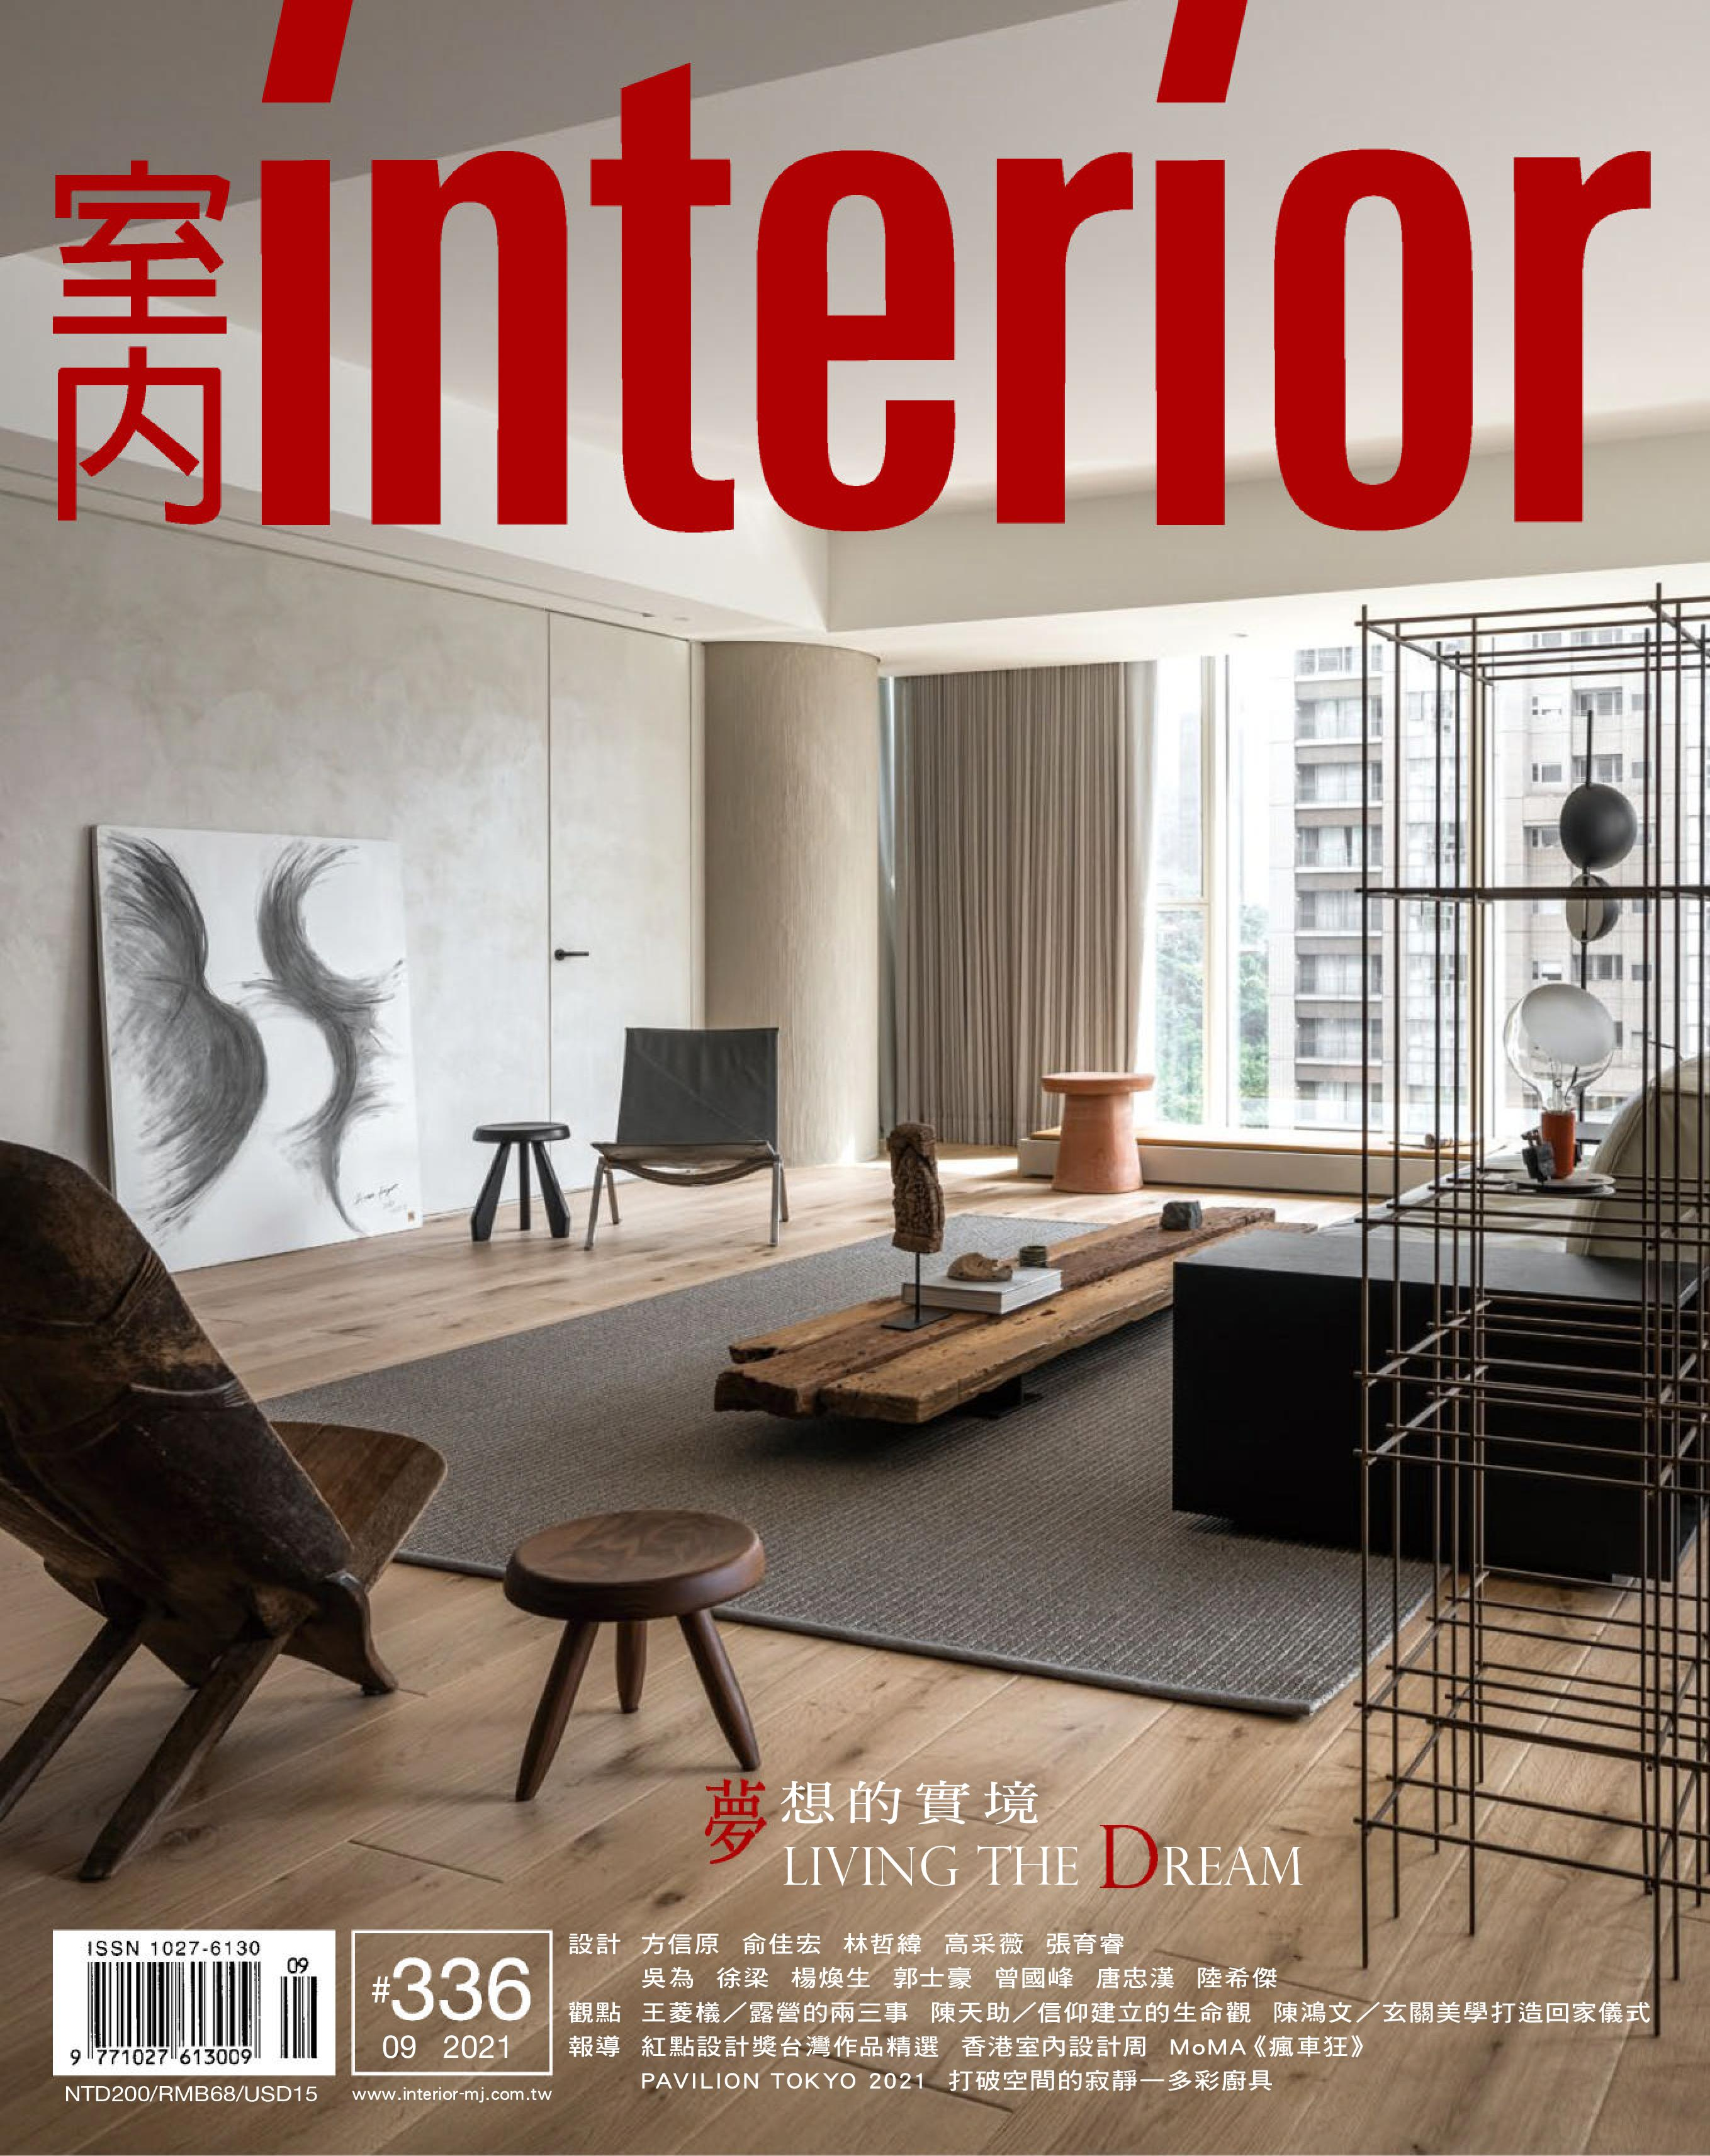 Interior Taiwan 室內 - 九月 2021